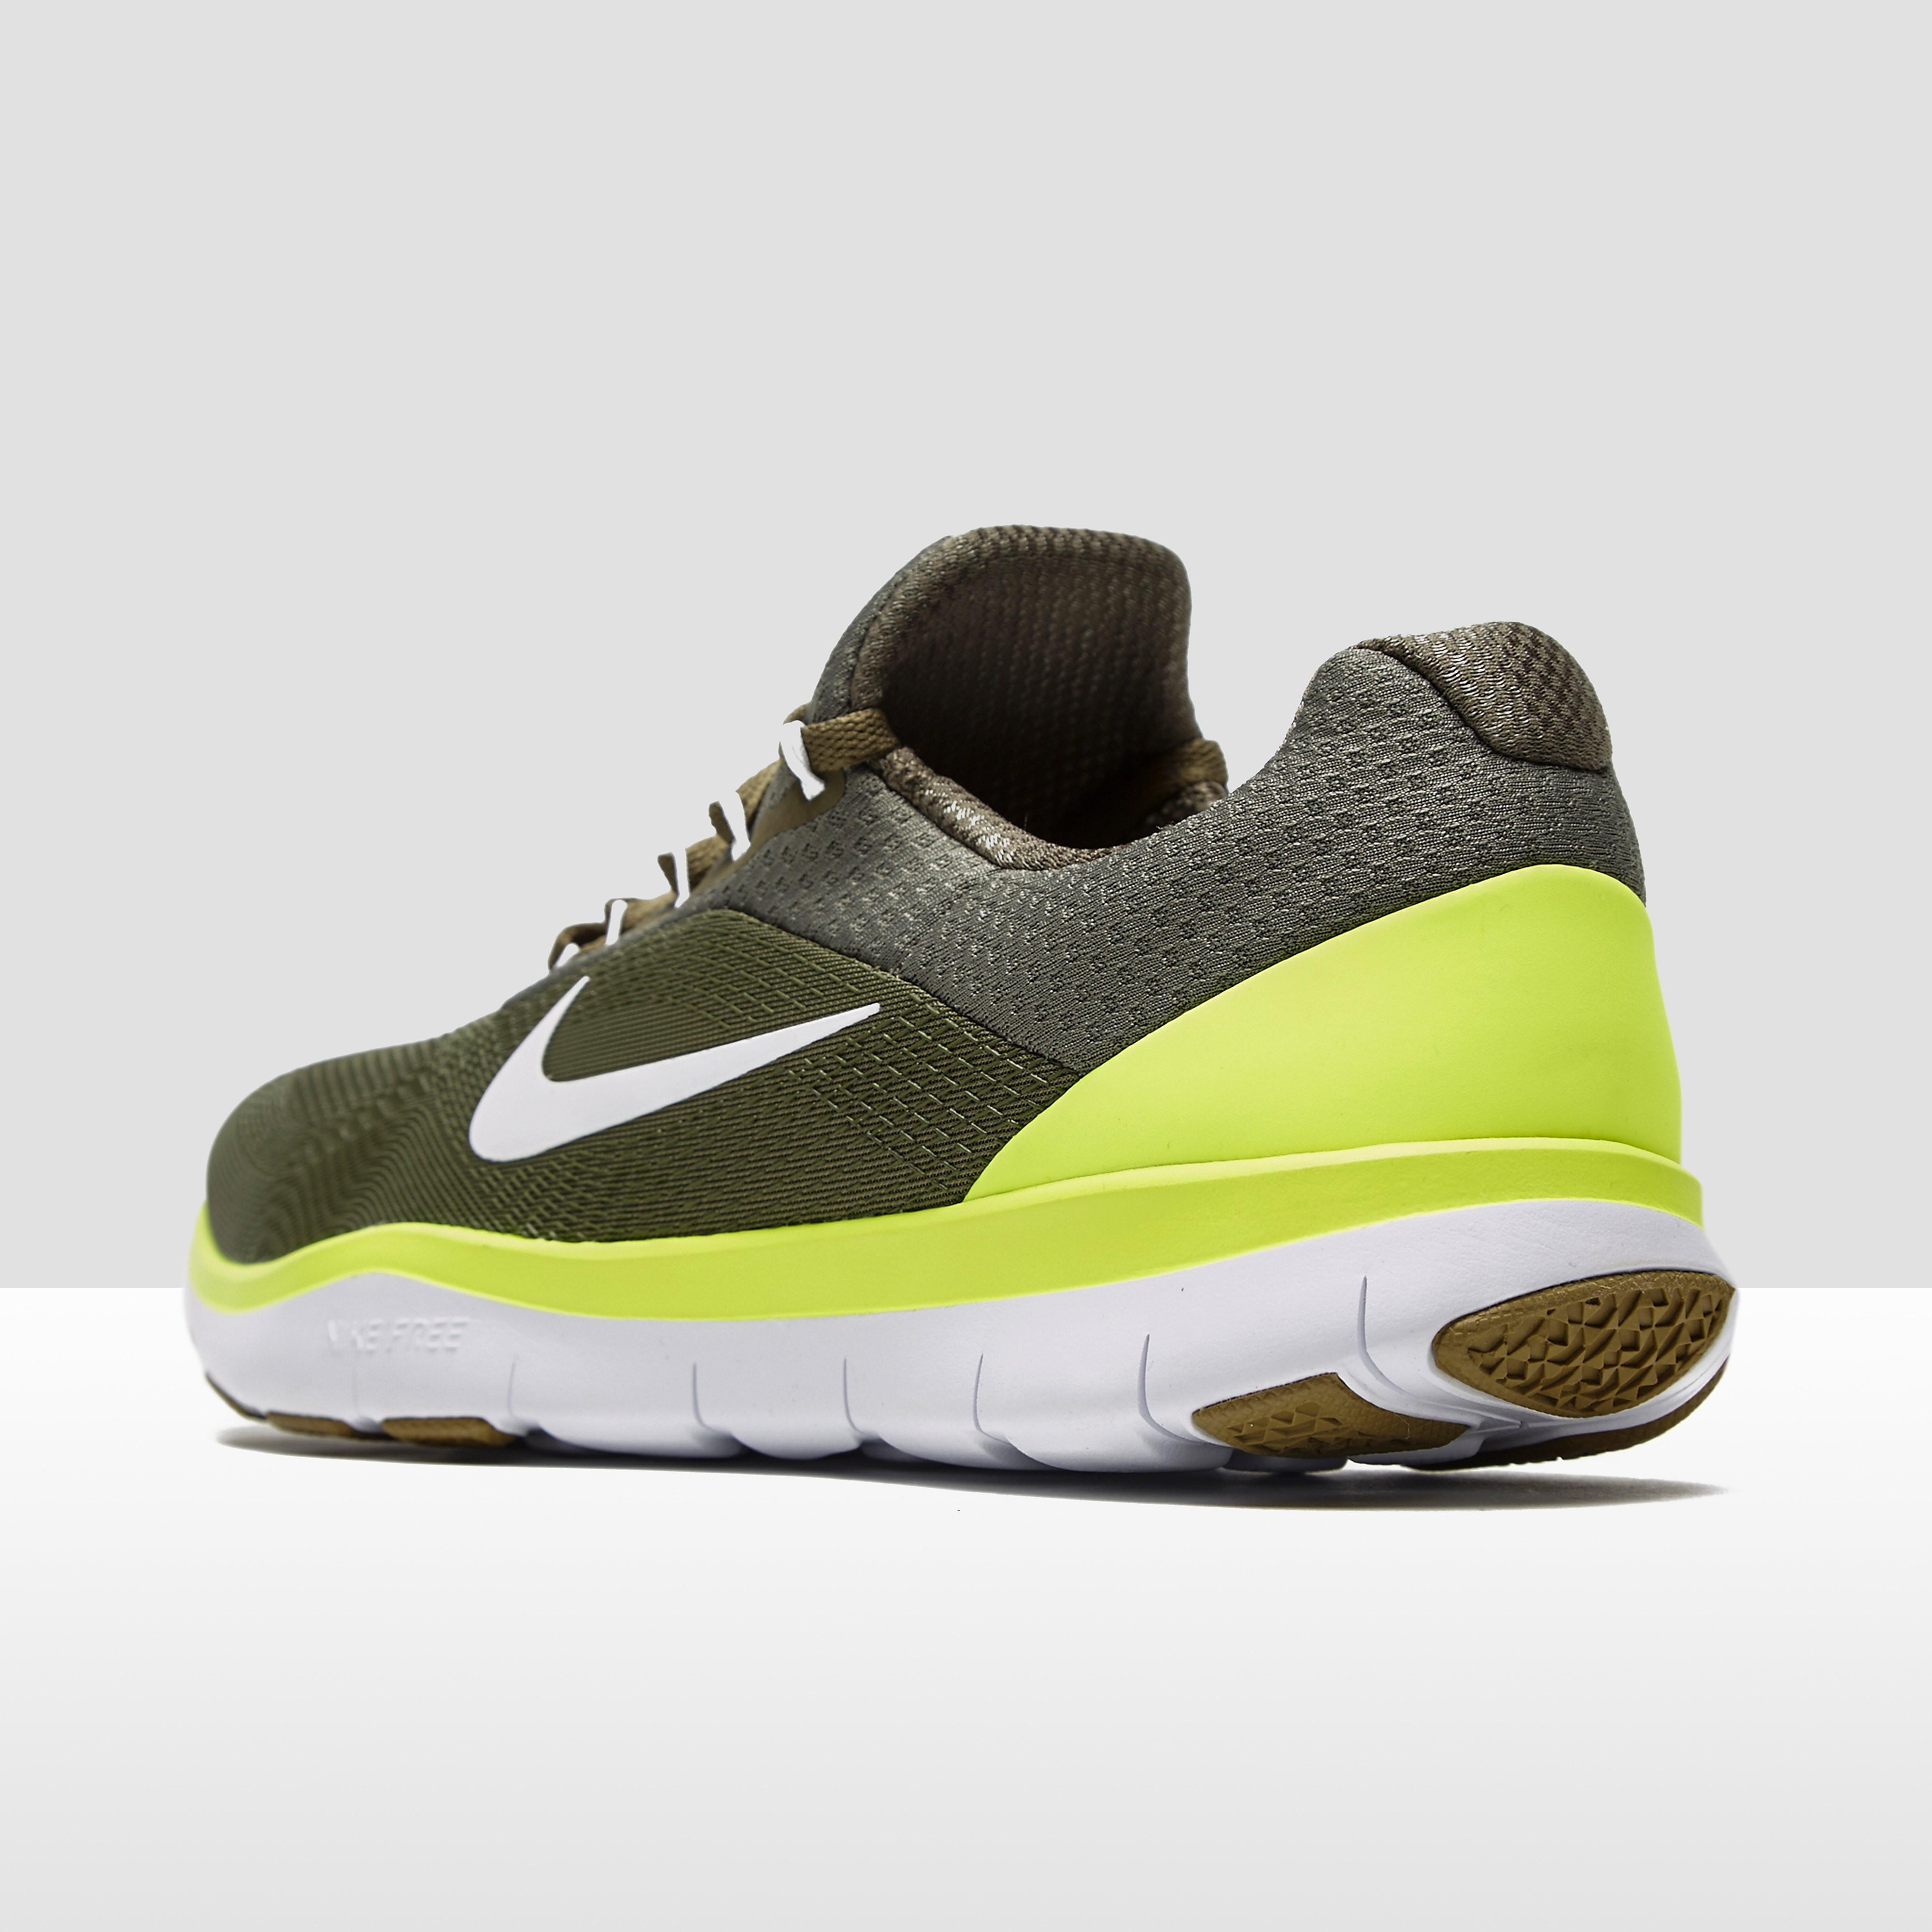 Nike Free Trainer V7 Men's Training Shoes